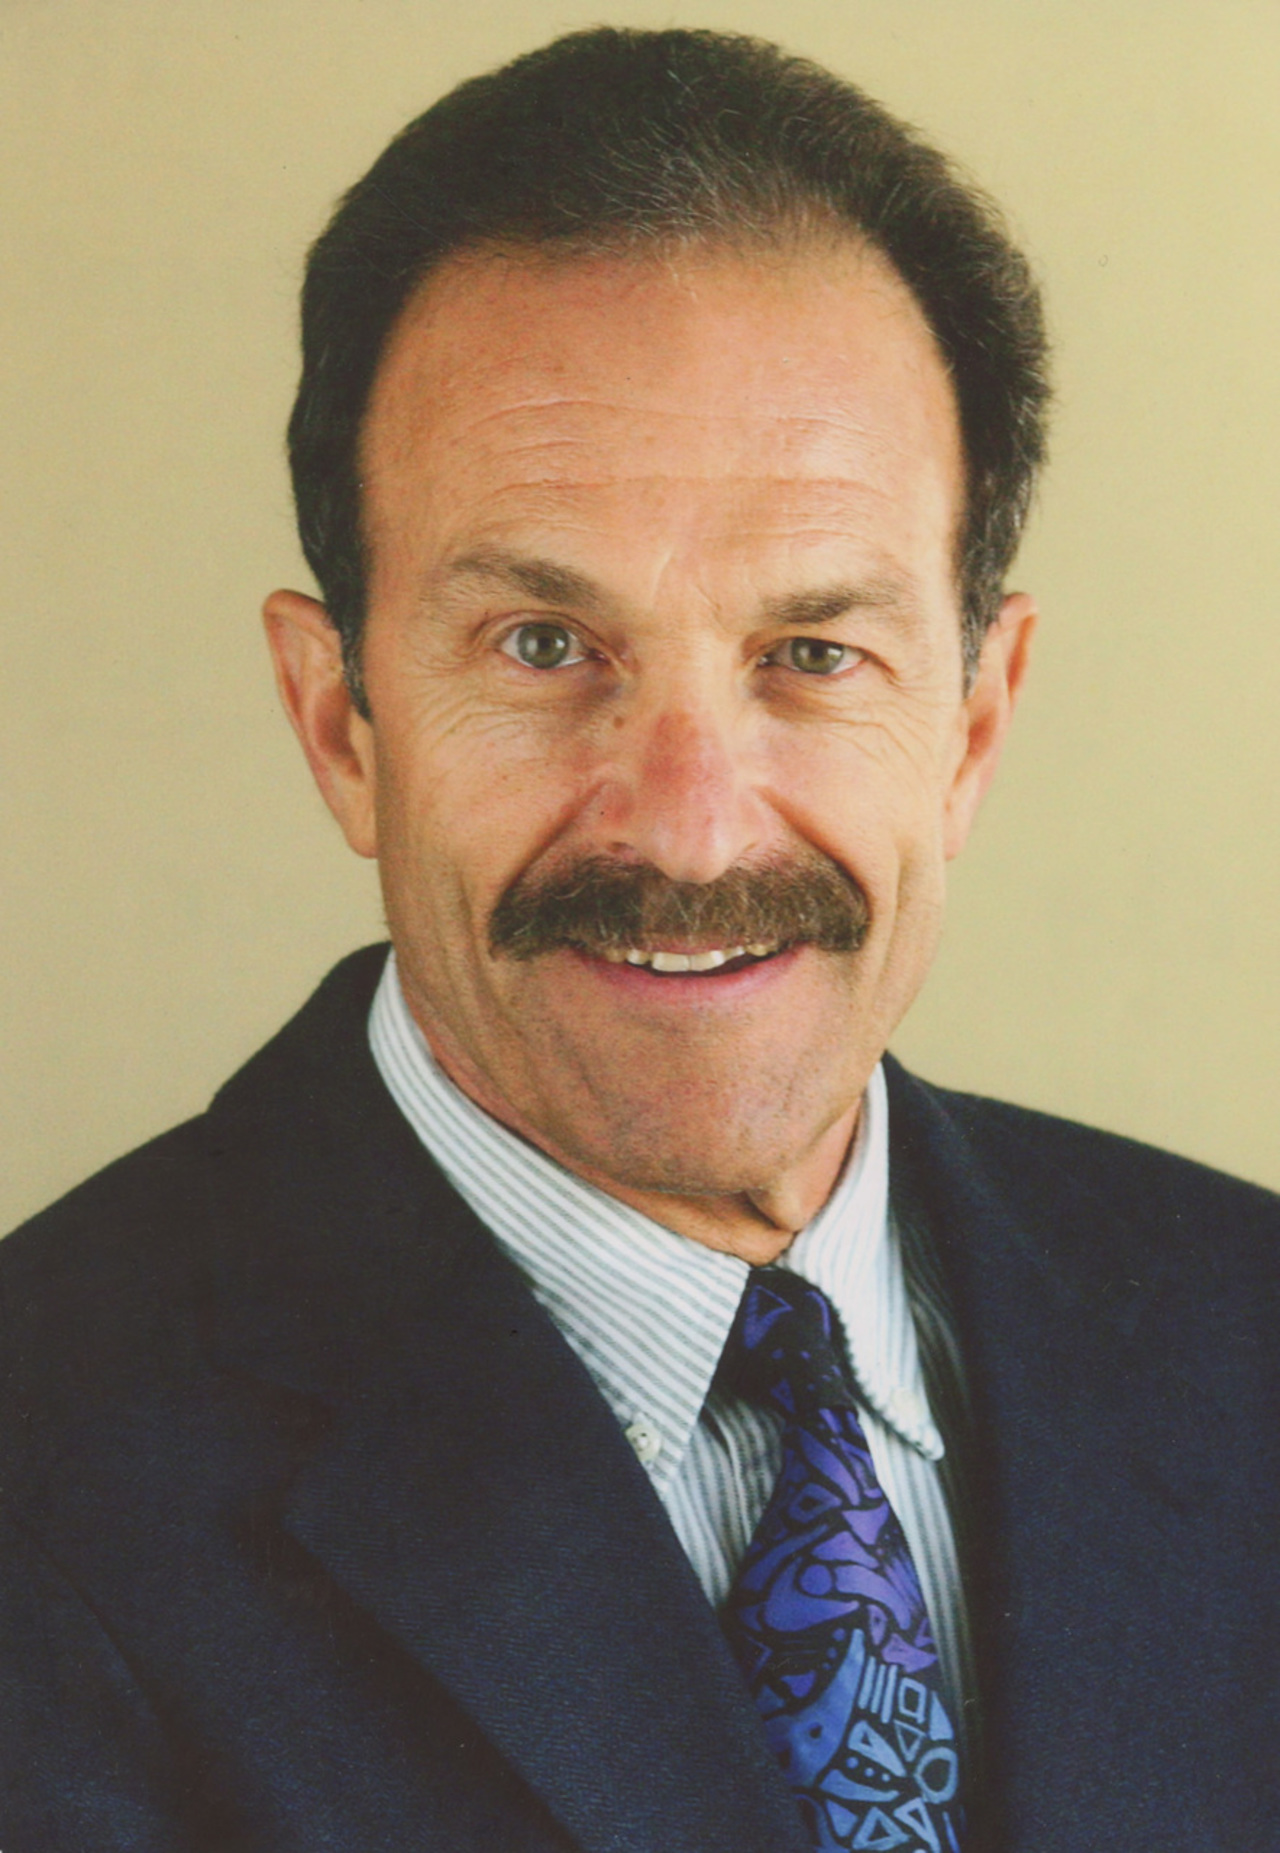 The Martin Greenberger Scholarship